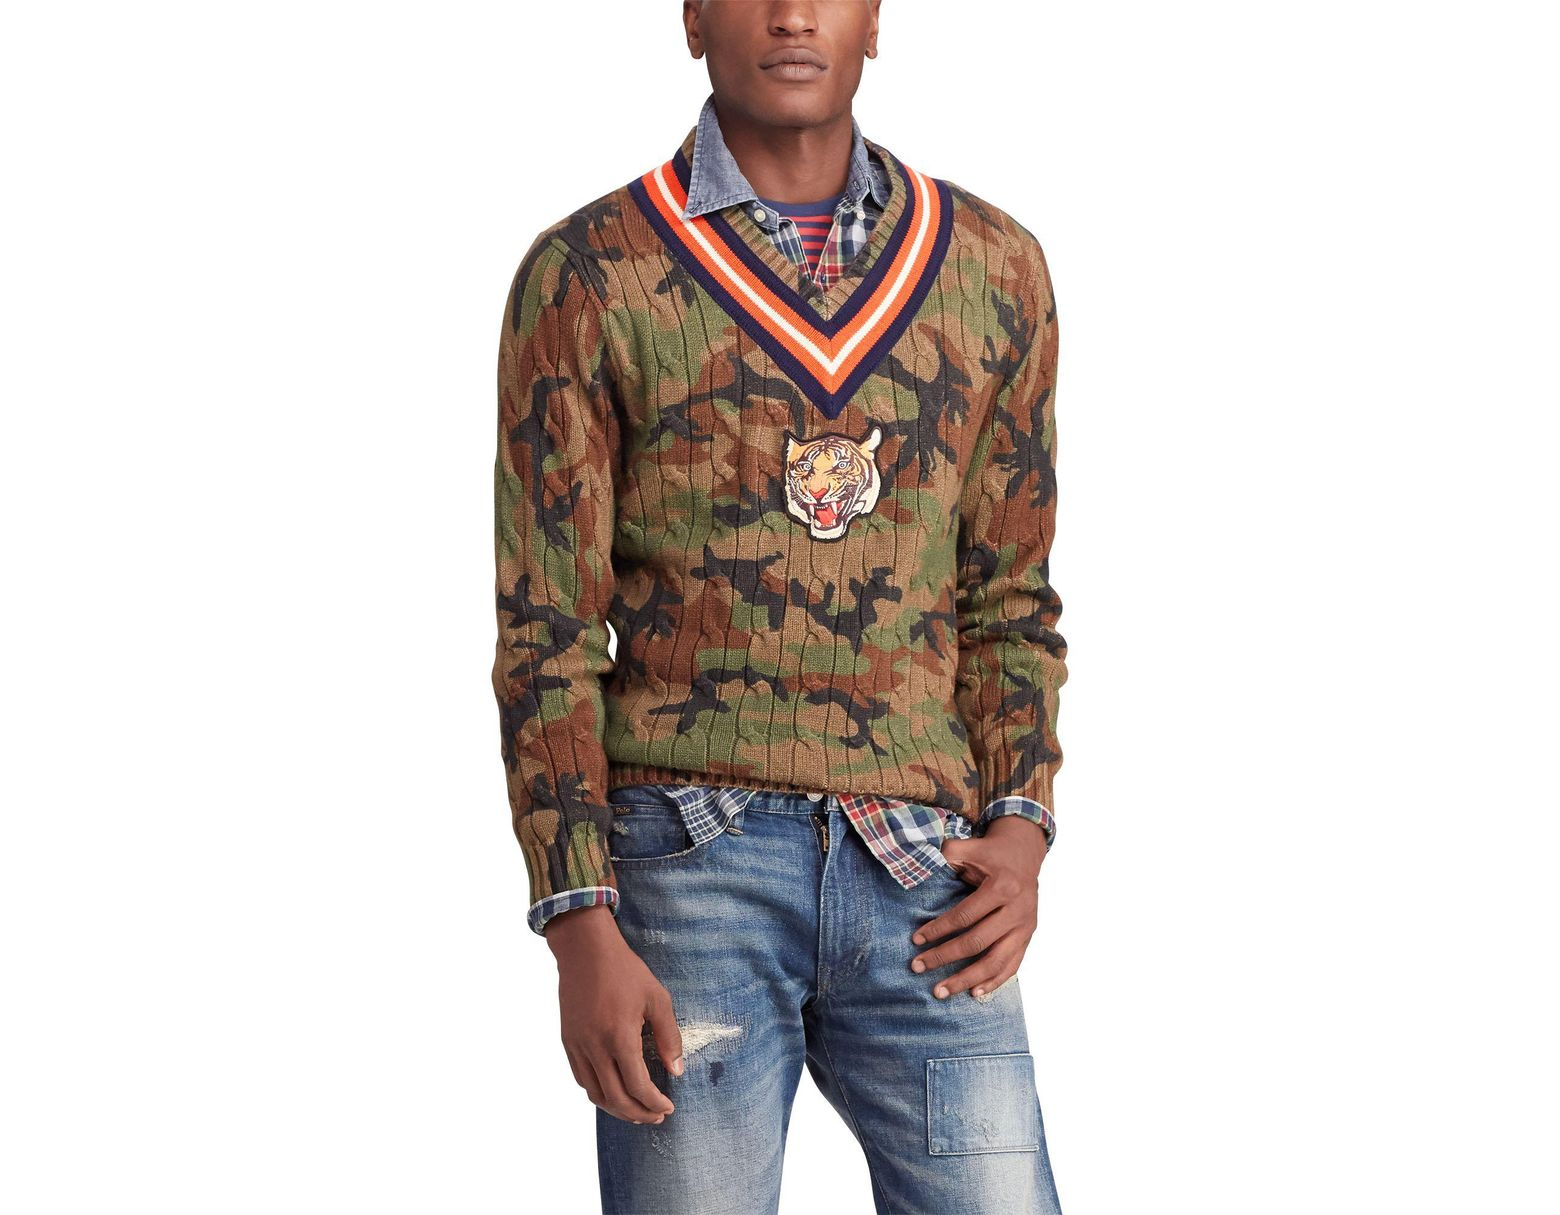 b7f46da5 Polo Ralph Lauren Multicoloured V-neck Sweater for Men - Save 59% - Lyst